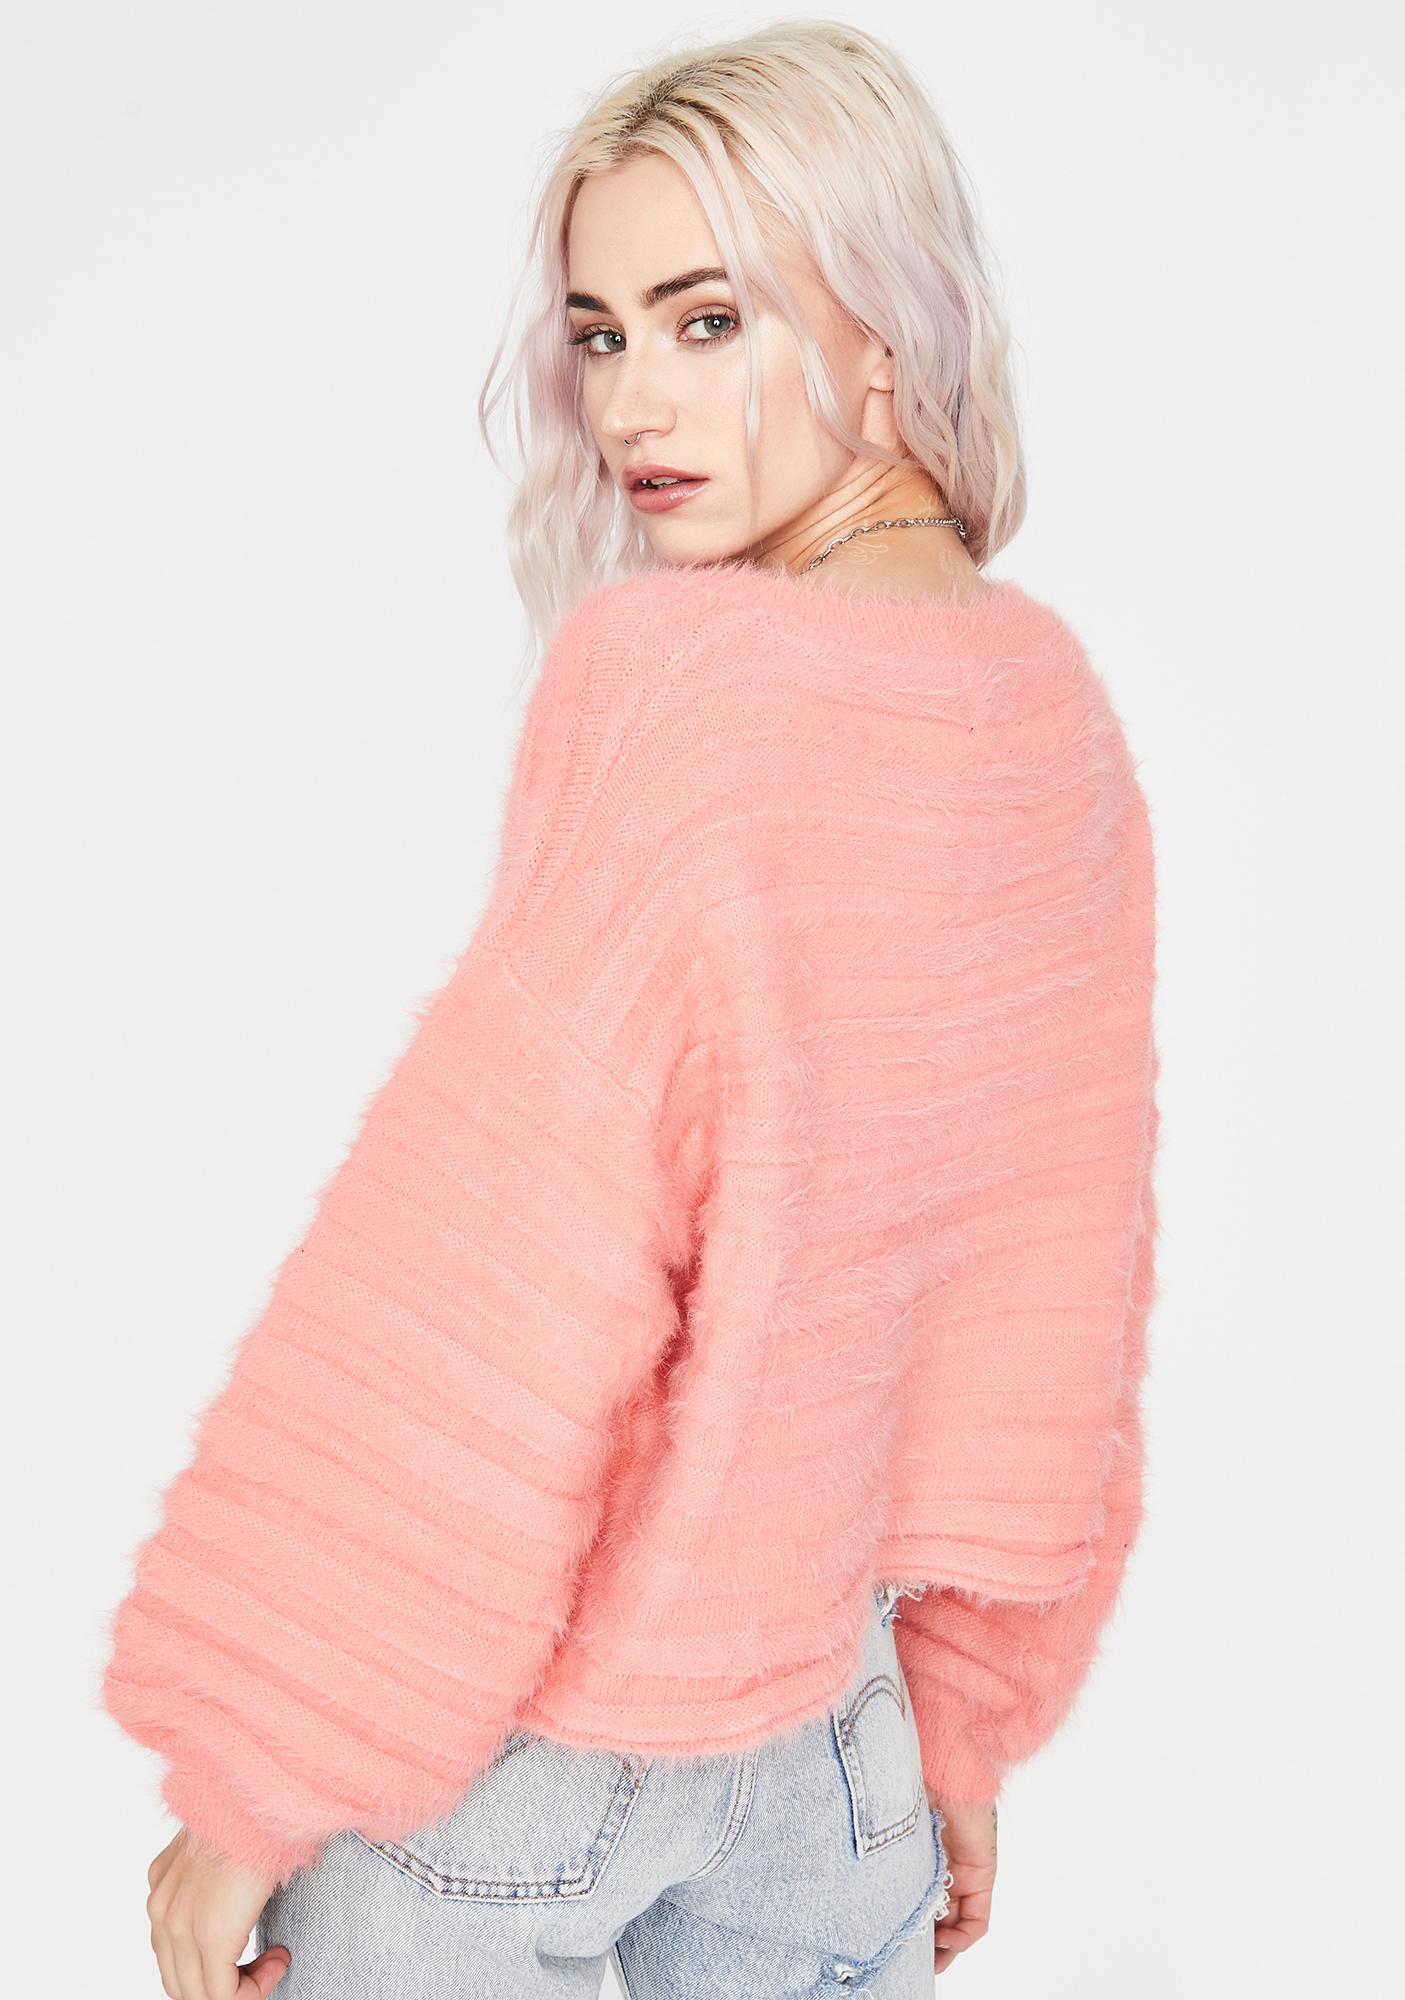 Coral Schoolgirl Crush Fuzzy Sweater